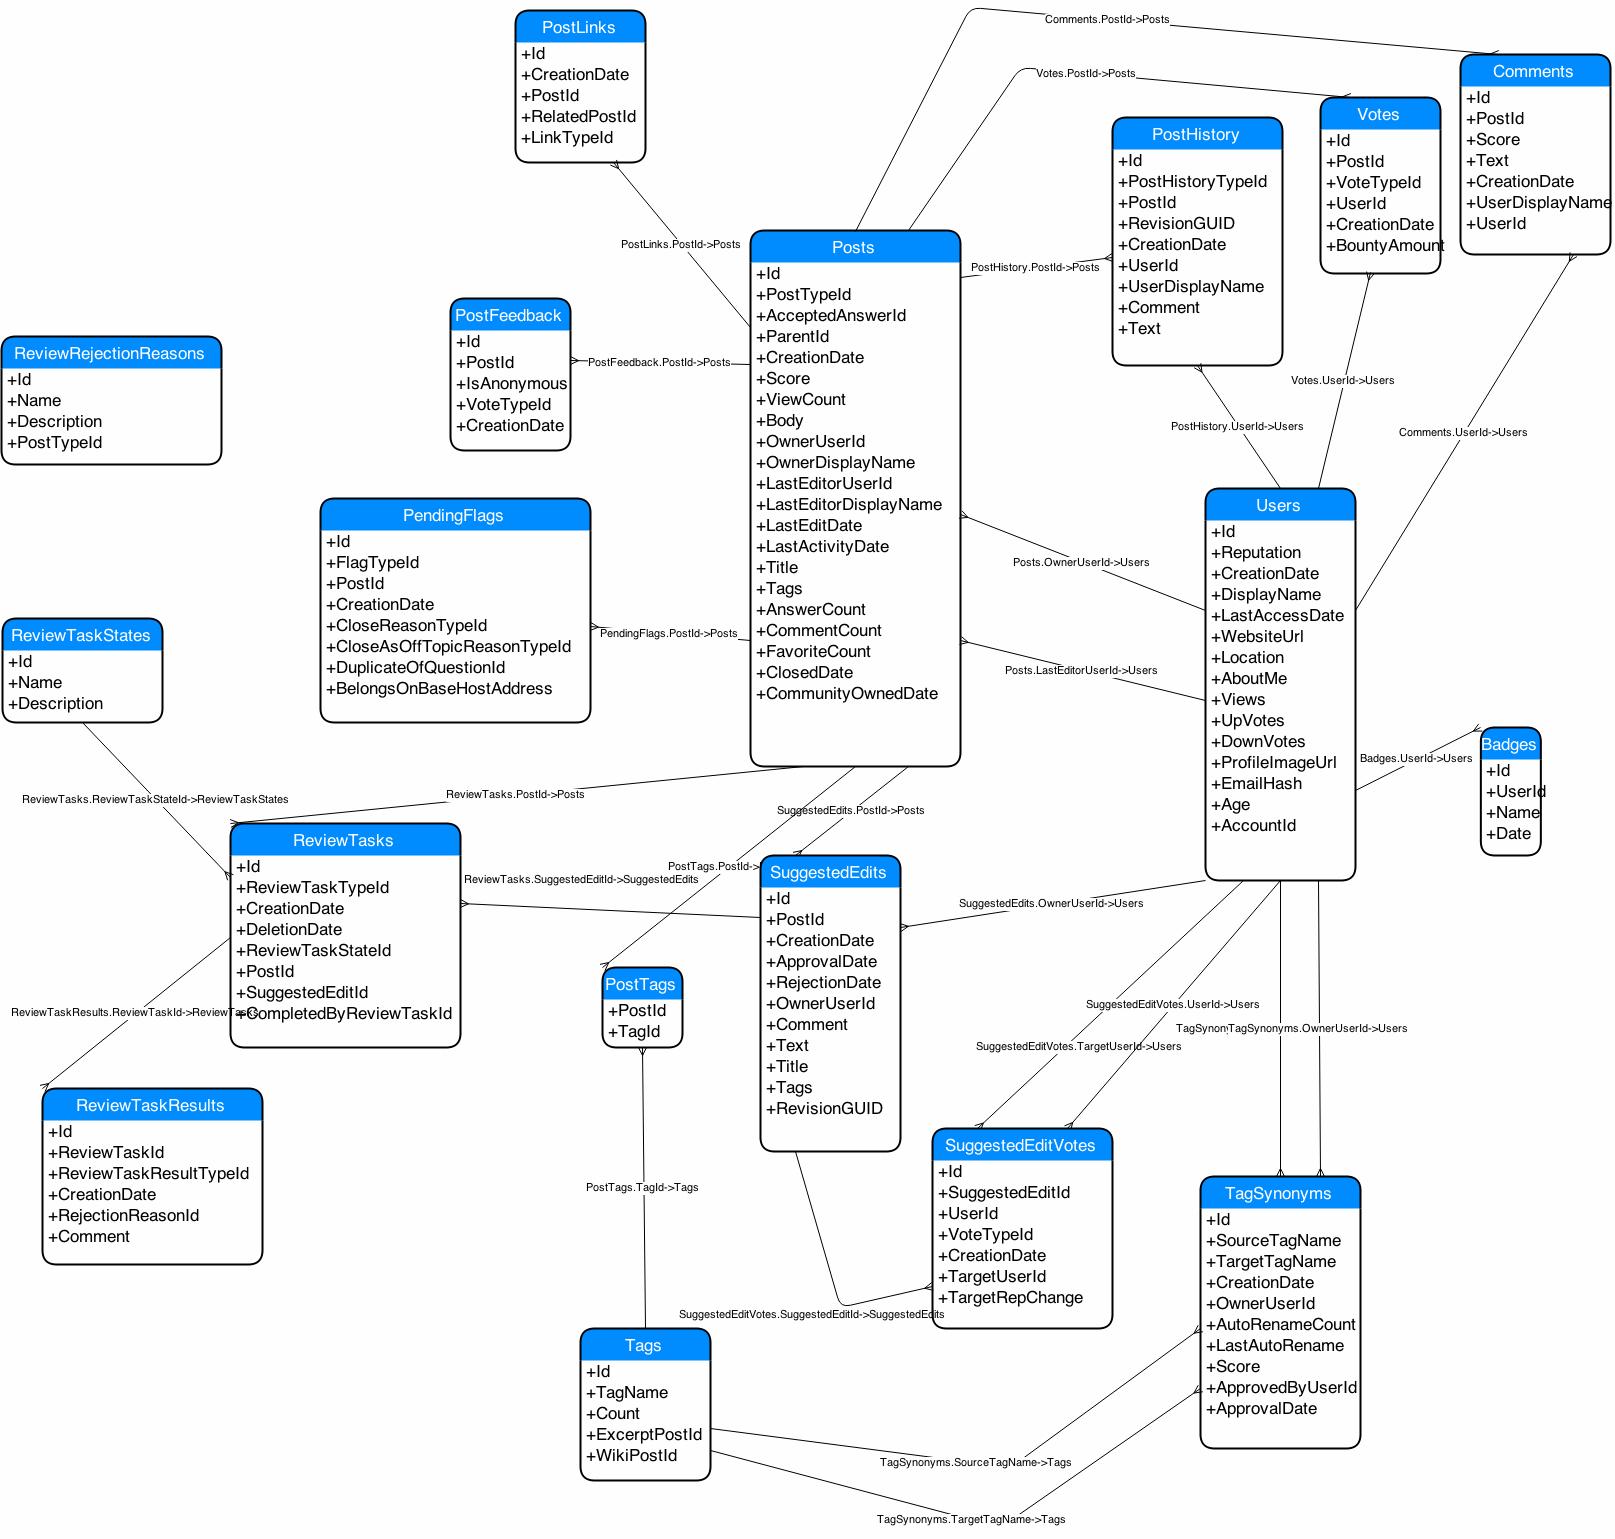 Database Diagram Of Stack Exchange Model? - Meta Stack Exchange with regard to Database Model Diagram